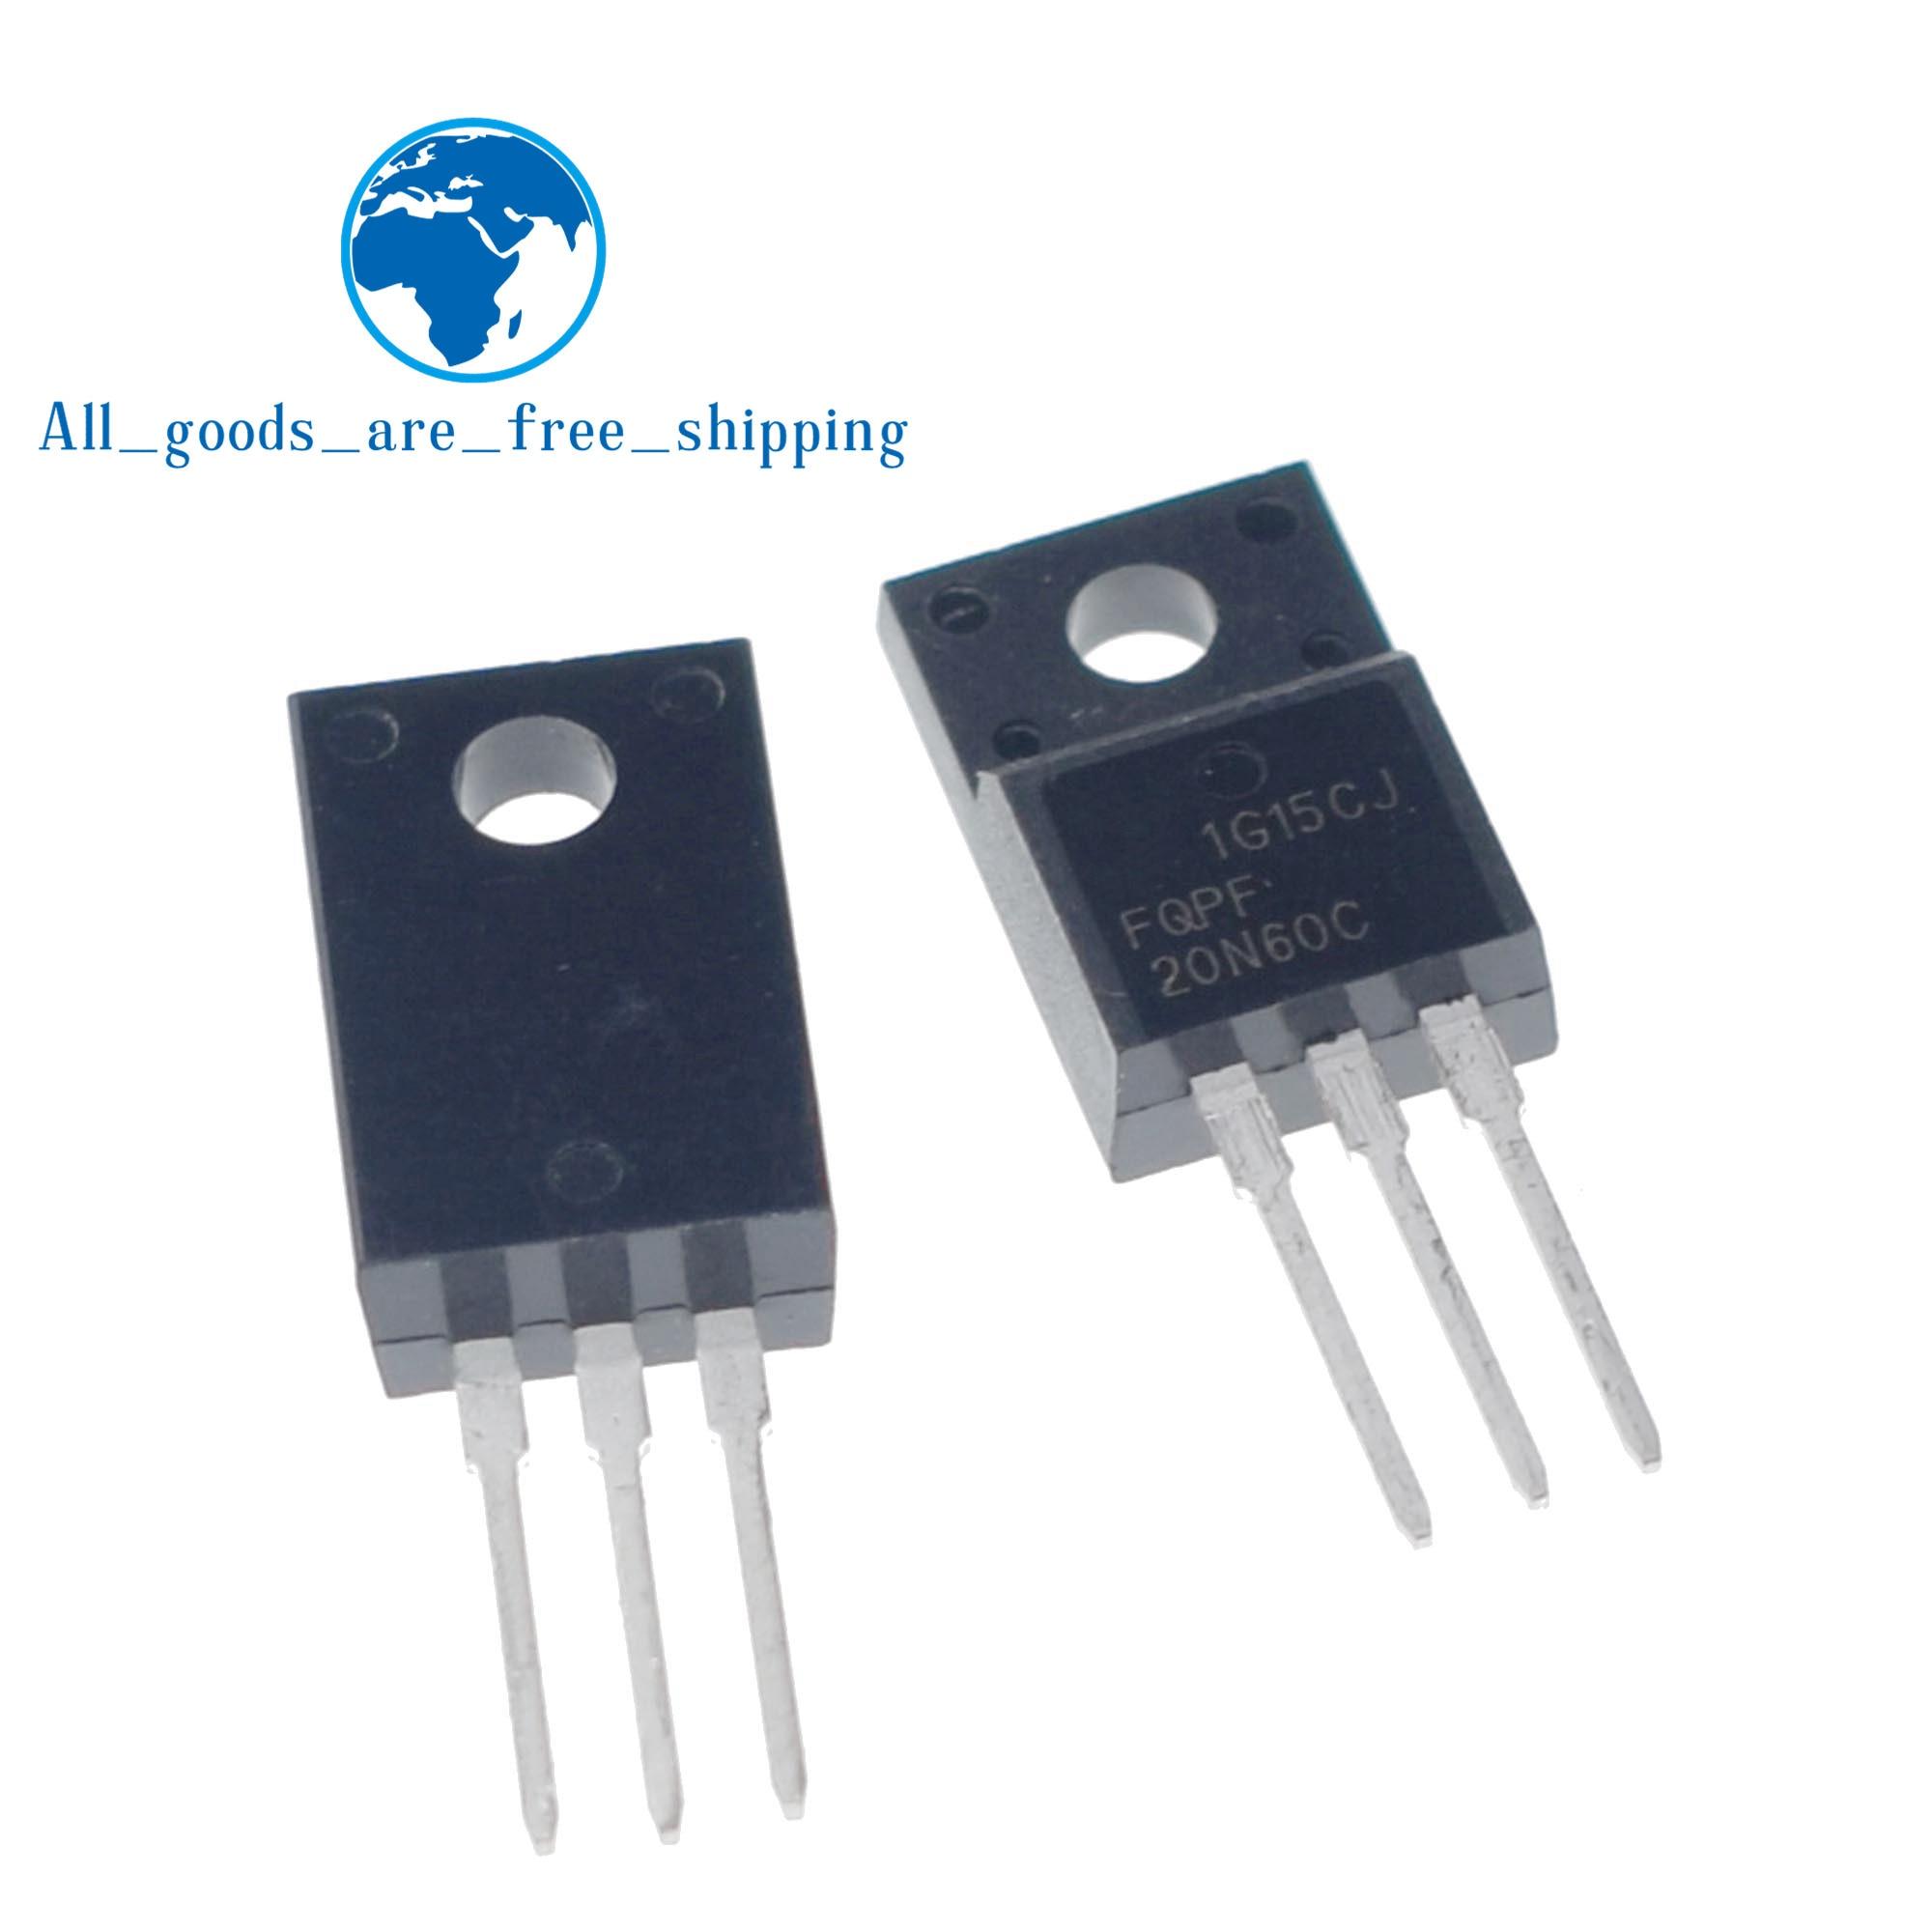 10PCS 20N60 FQPF20N60C FQPF20N60 600V 20A LCD power FET 100% new original quality assurance